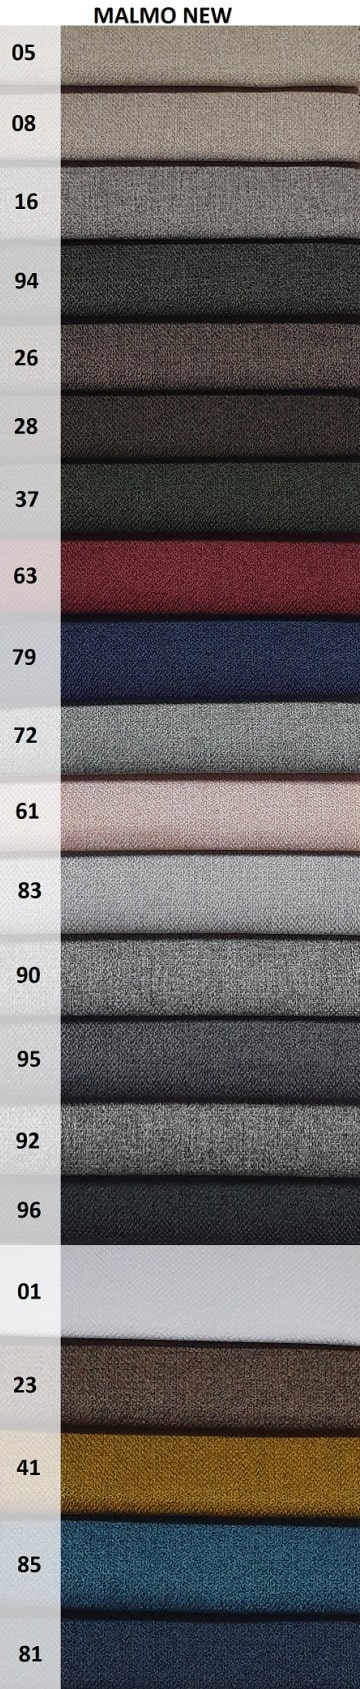 kolory tkaniny Malmo New na fotel uszak